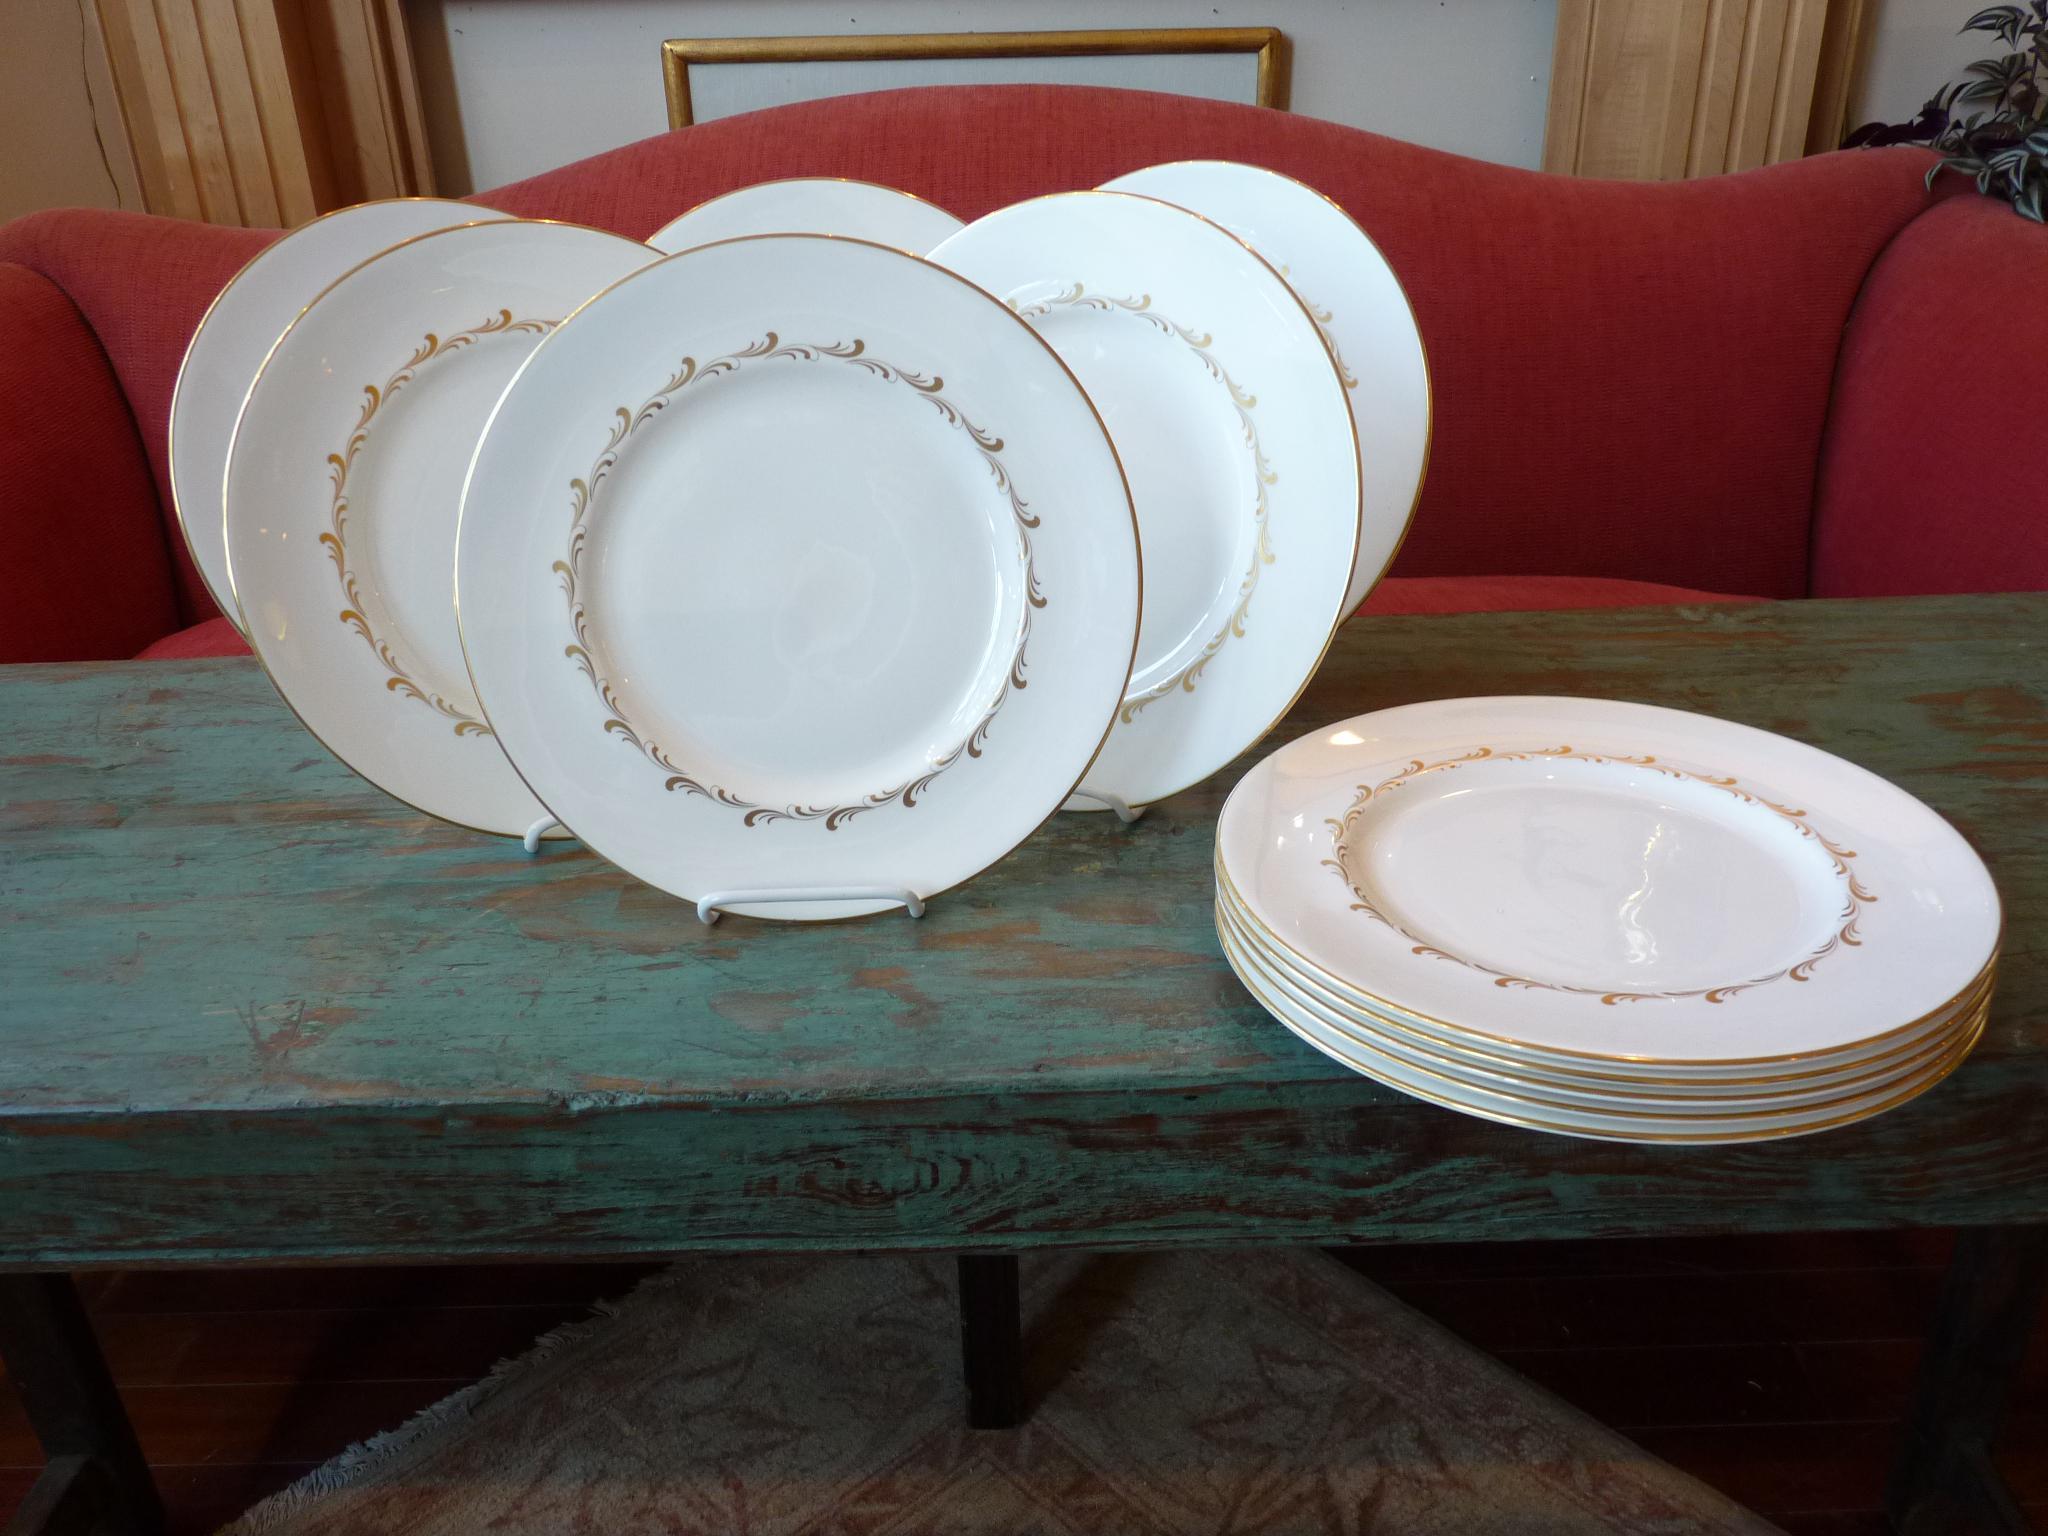 Royal Doulton Gold Rim Dinner Plates - Set of 10 - Image 2 of 7  sc 1 st  Chairish & Royal Doulton Gold Rim Dinner Plates - Set of 10 | Chairish